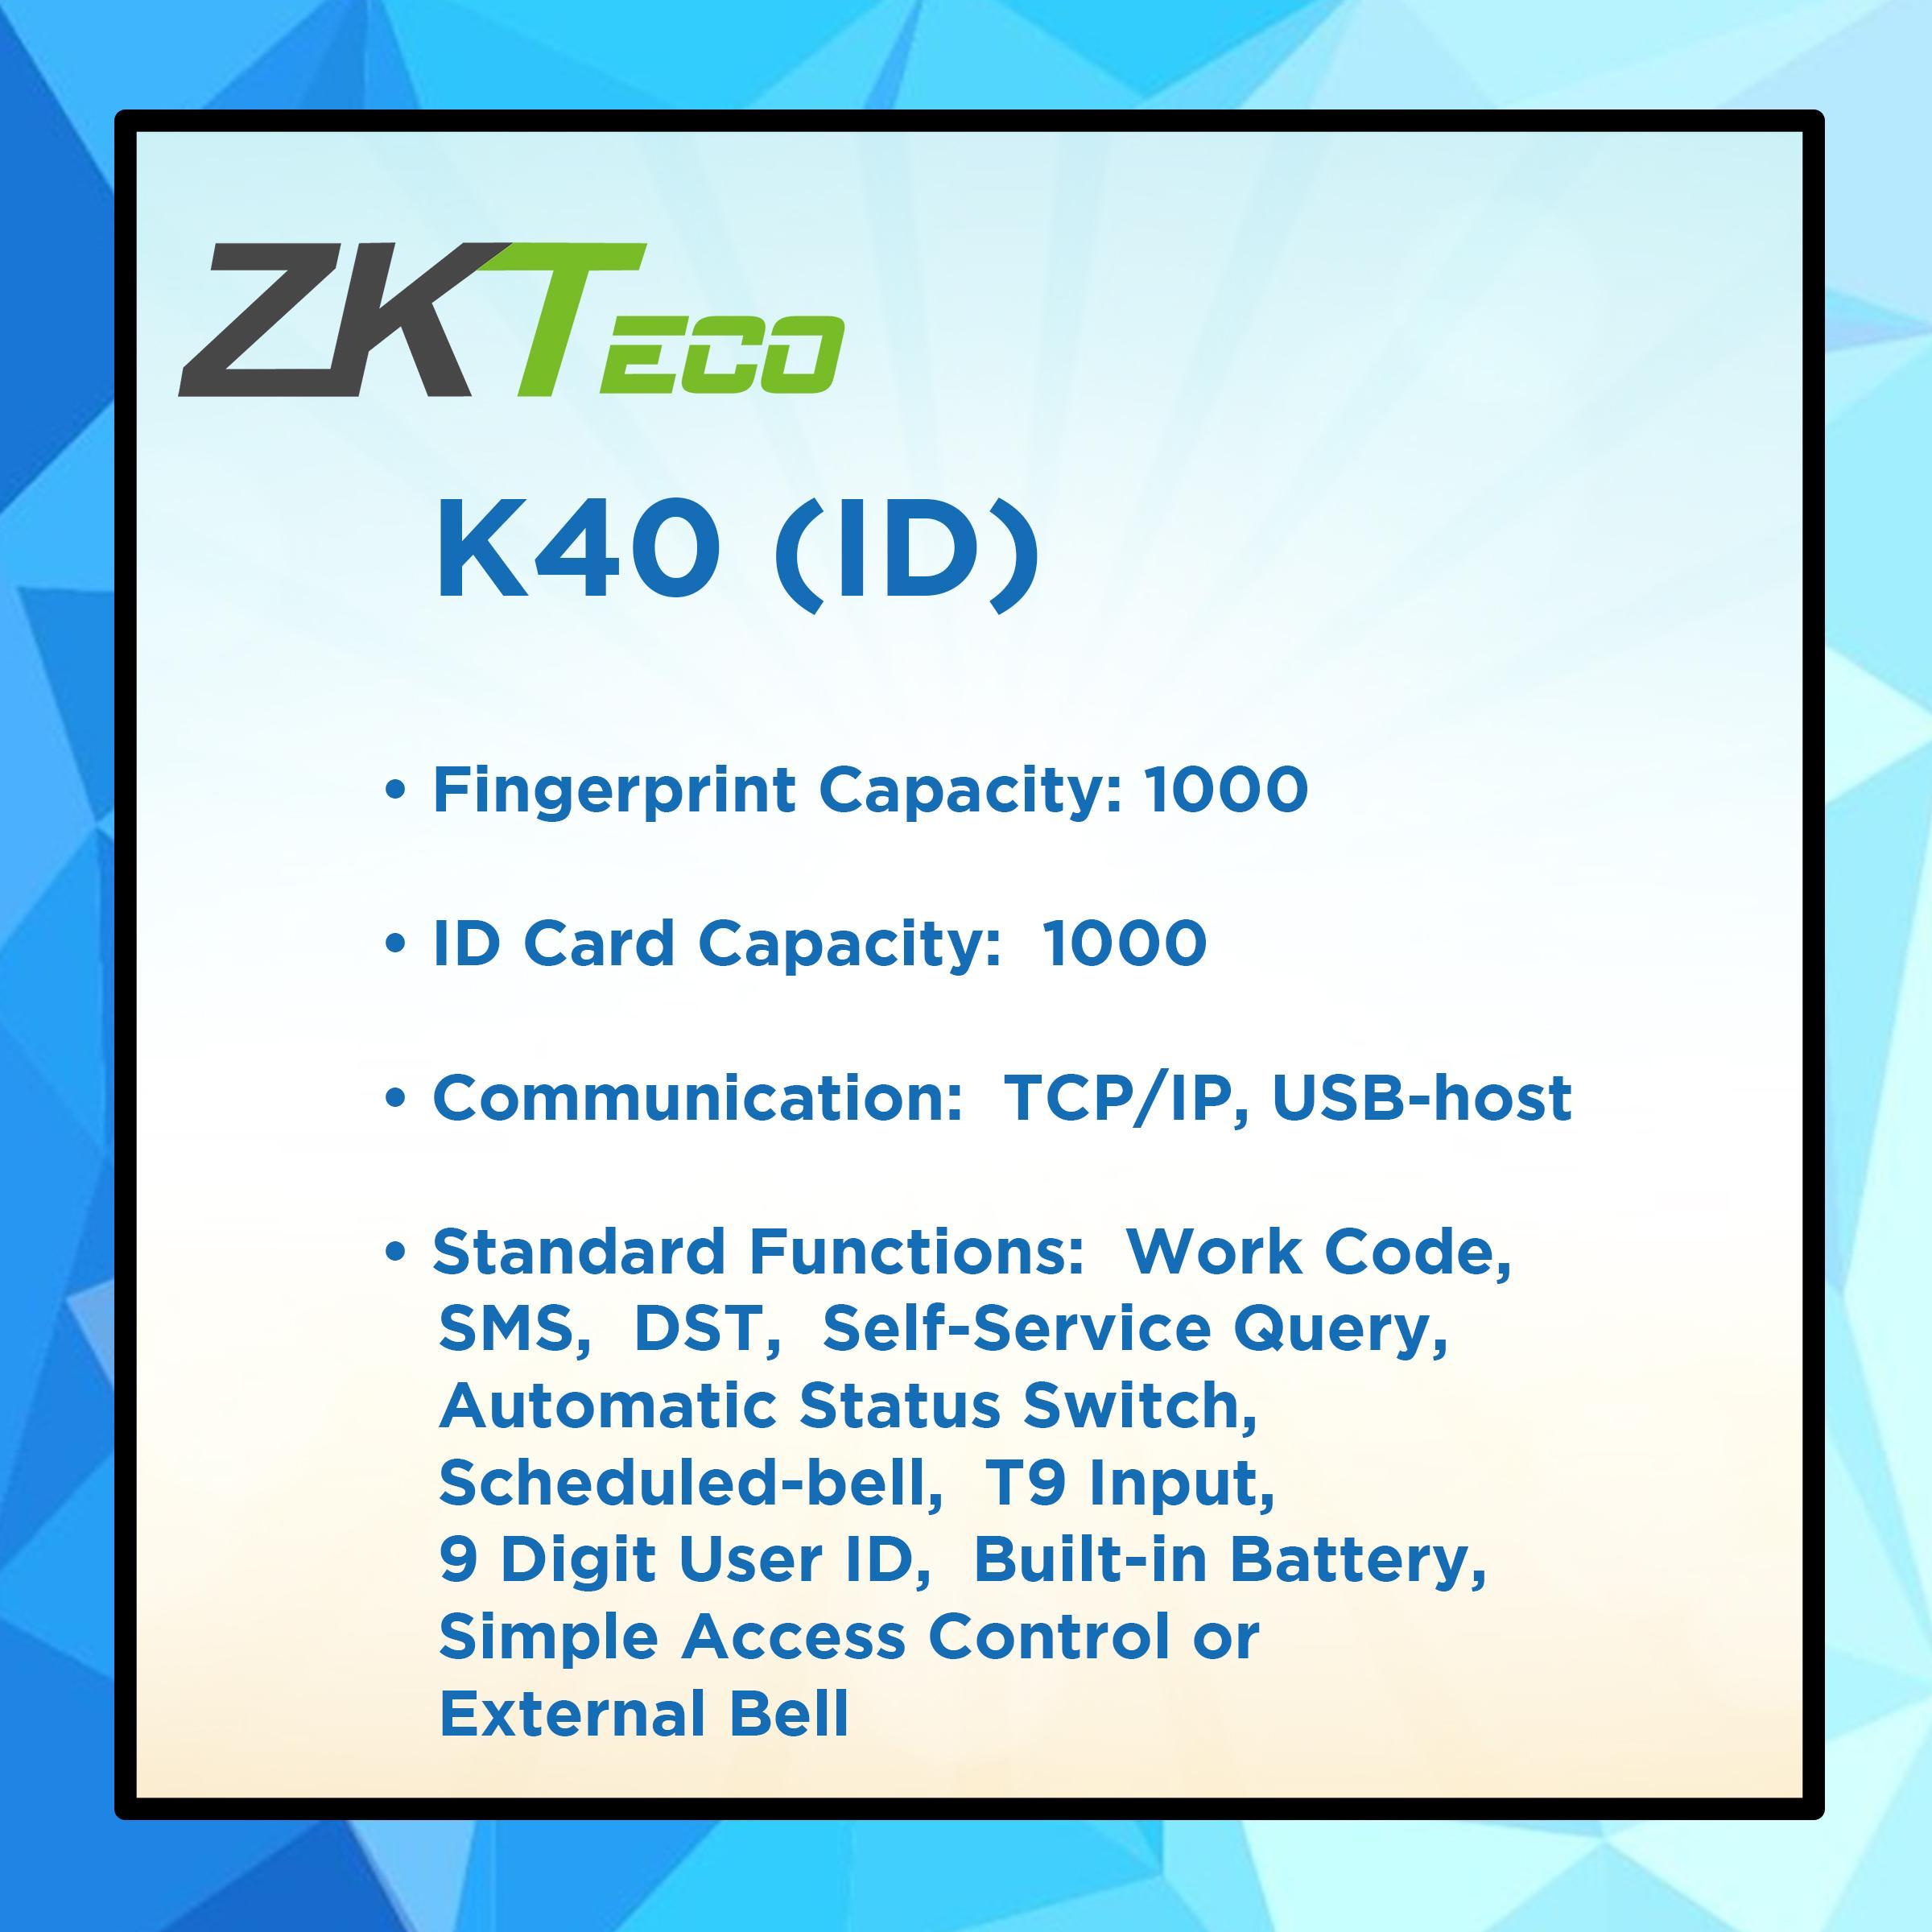 ZKTECO K40 Fingerprint Biometric Time Attendance Door Access Device